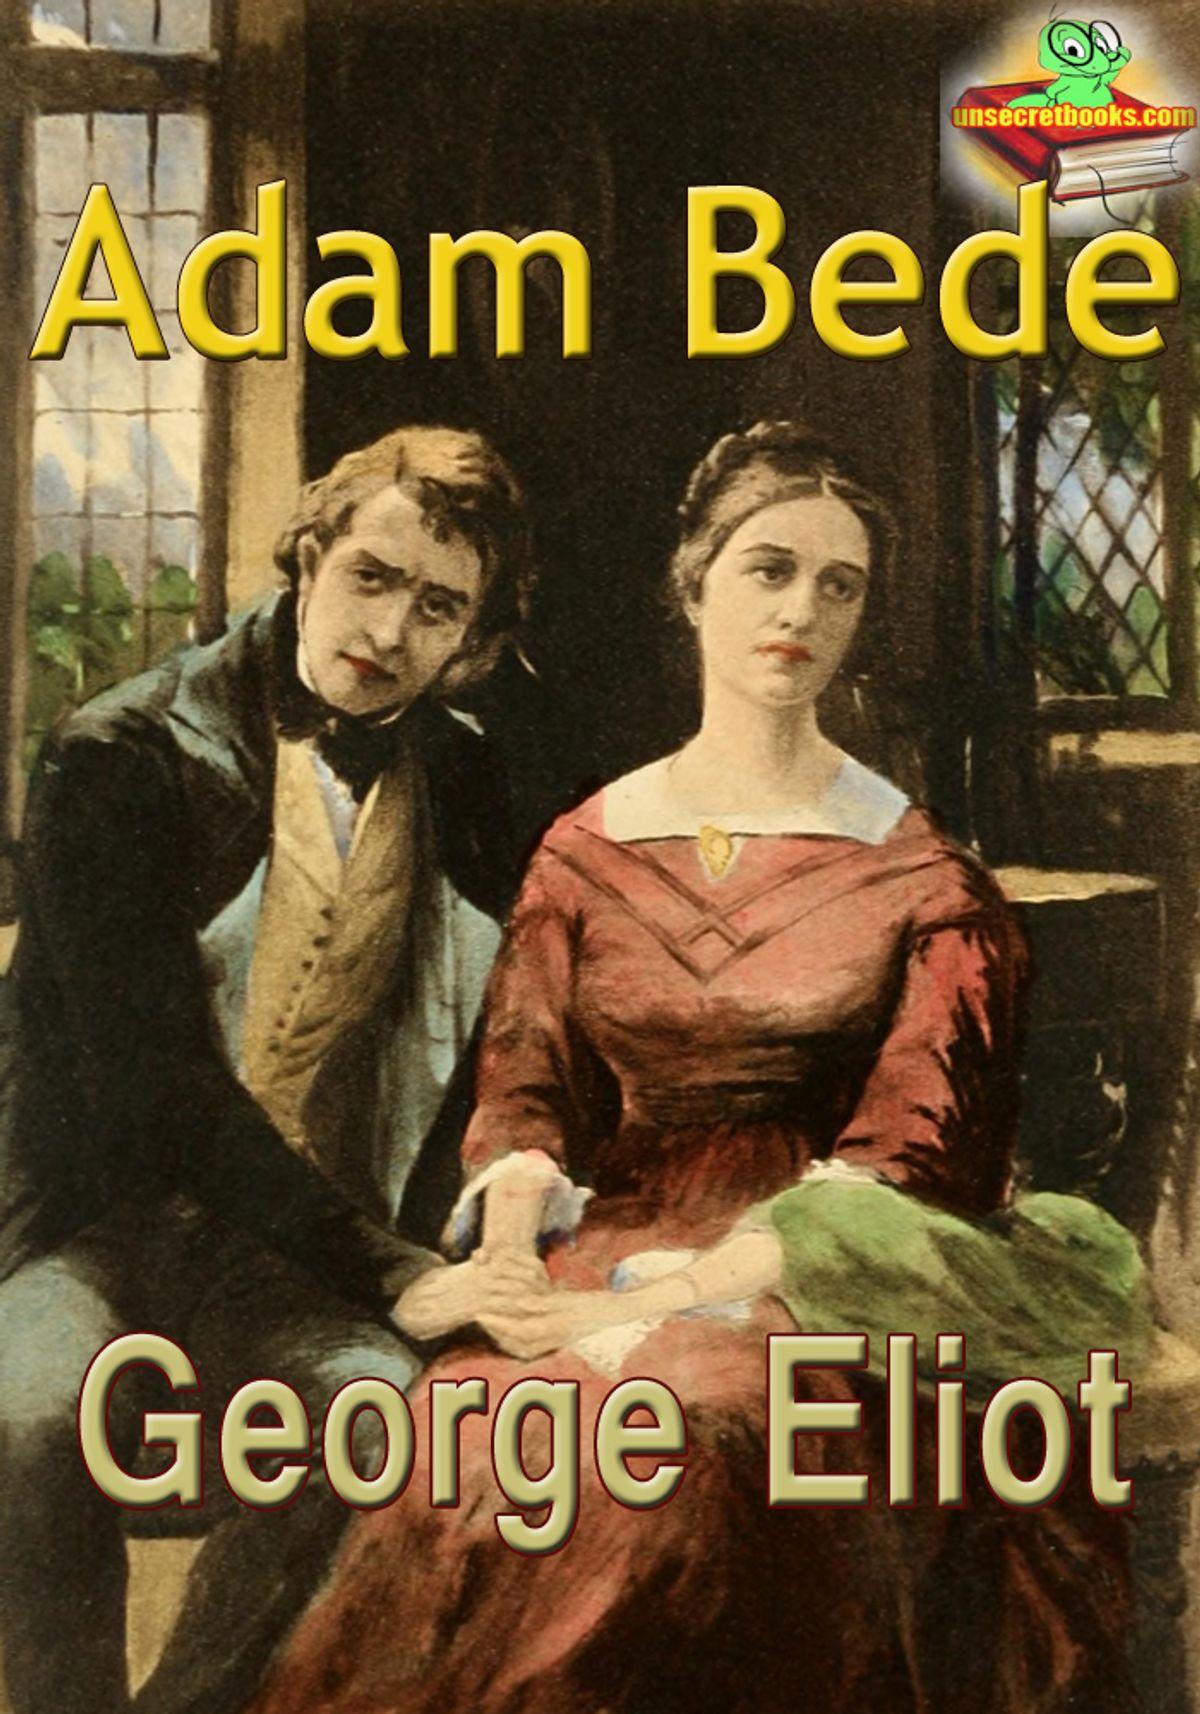 adam-bede-the-19th-century-english-literature